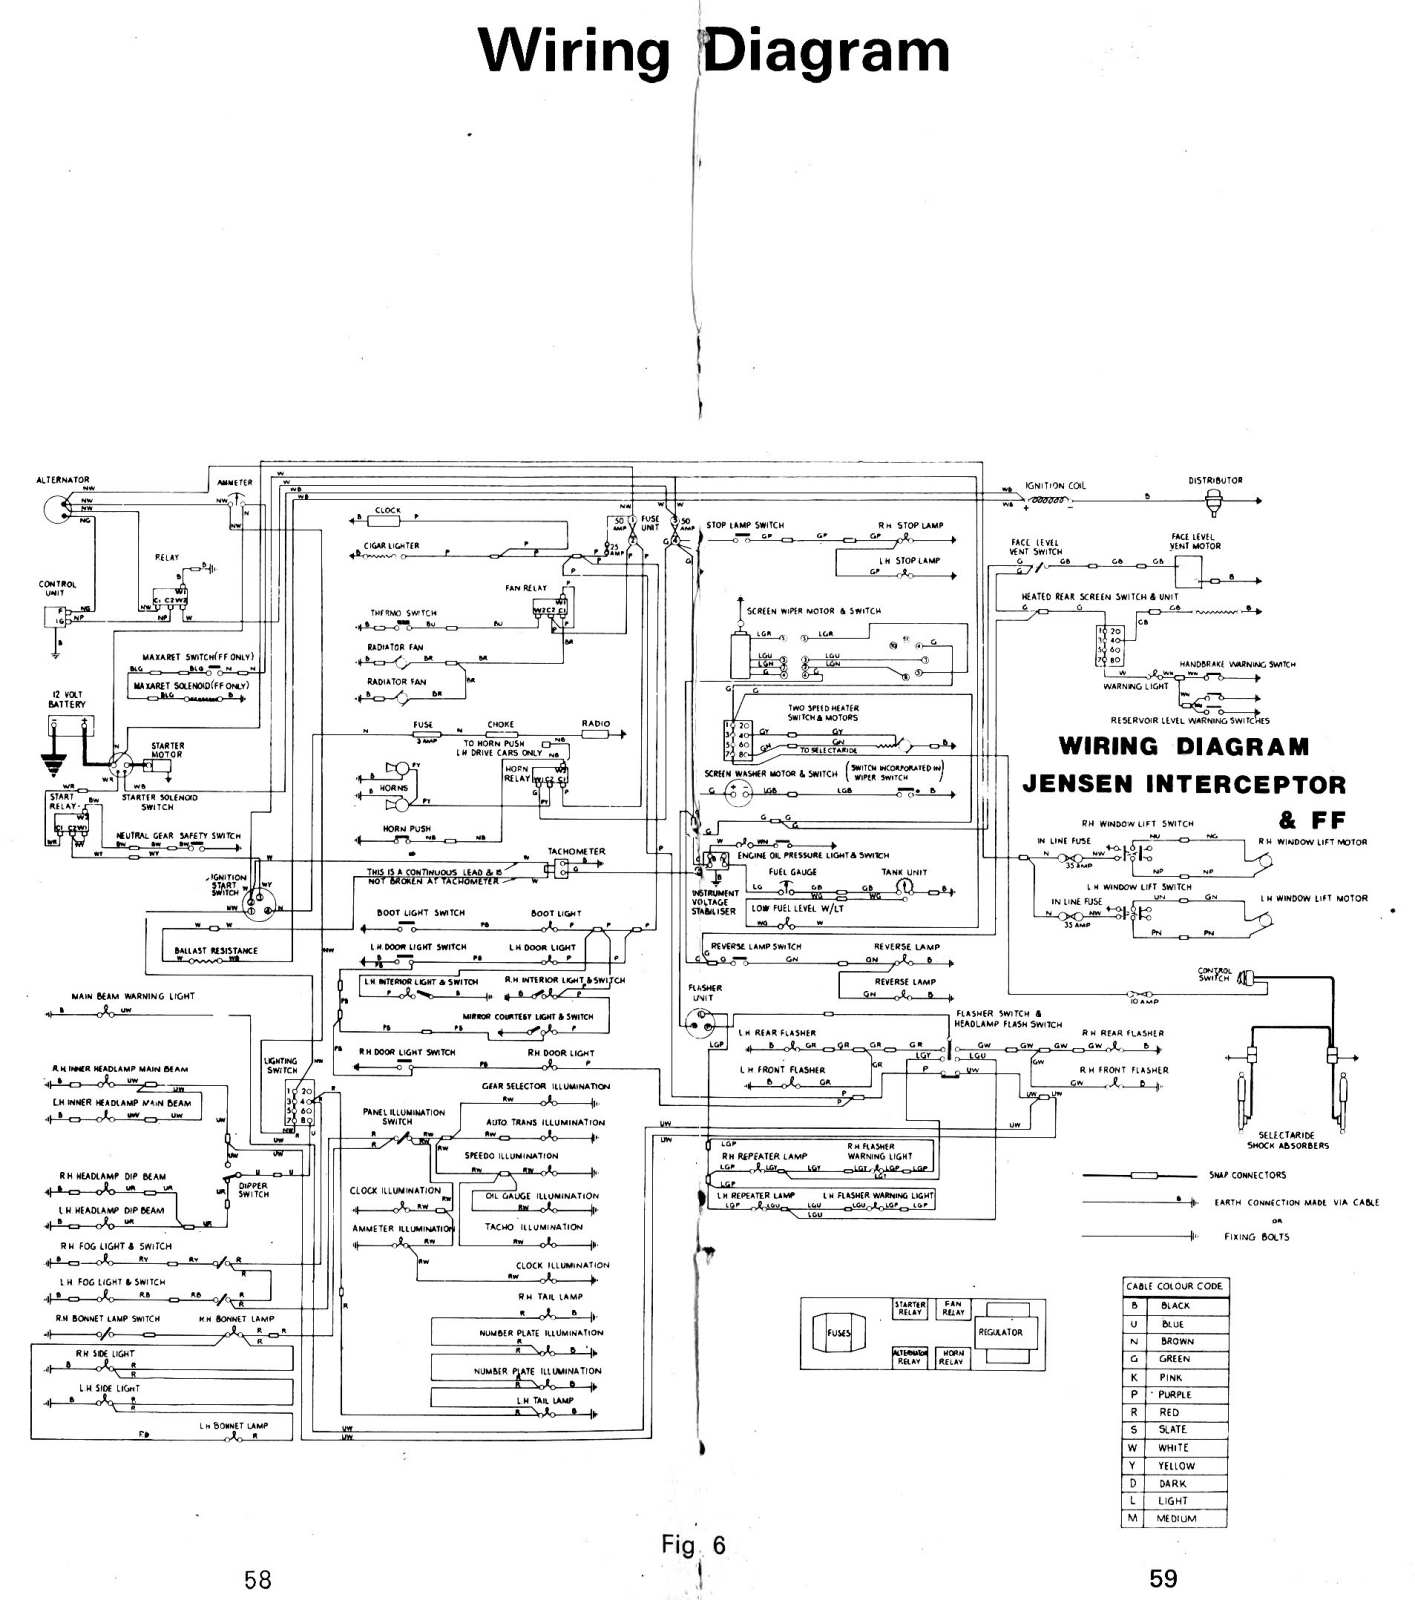 hight resolution of jensen interceptor wiring diagram 33 wiring diagram jensen marine radio wiring diagram jensen dvd wiring